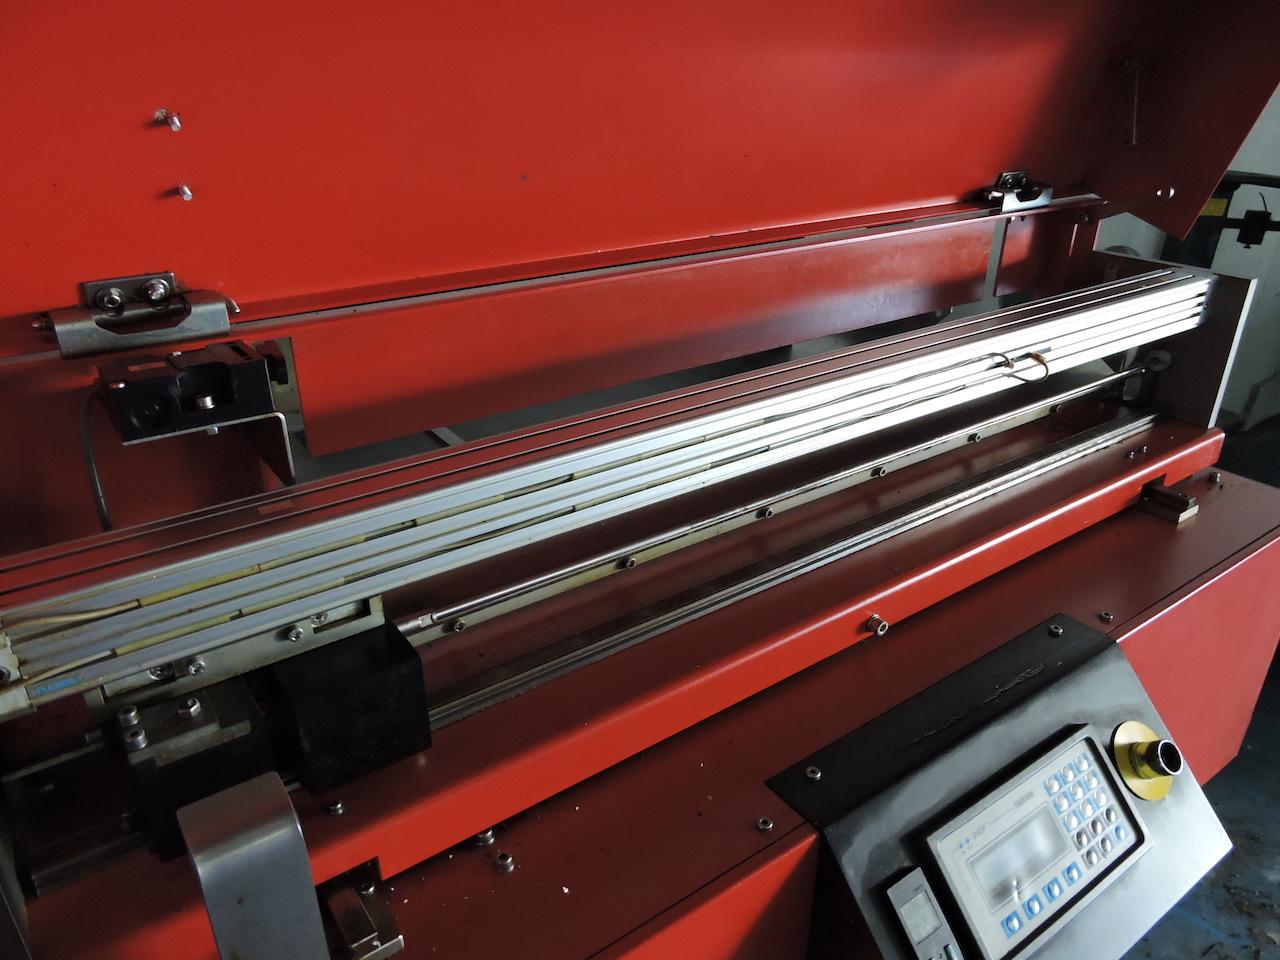 Lot 5 - EMCO LM800 COMPACT BARFEEDER; W/Bar-Stock Dia. 6-25.5 mm; Bar Stock Length 100-600mm.